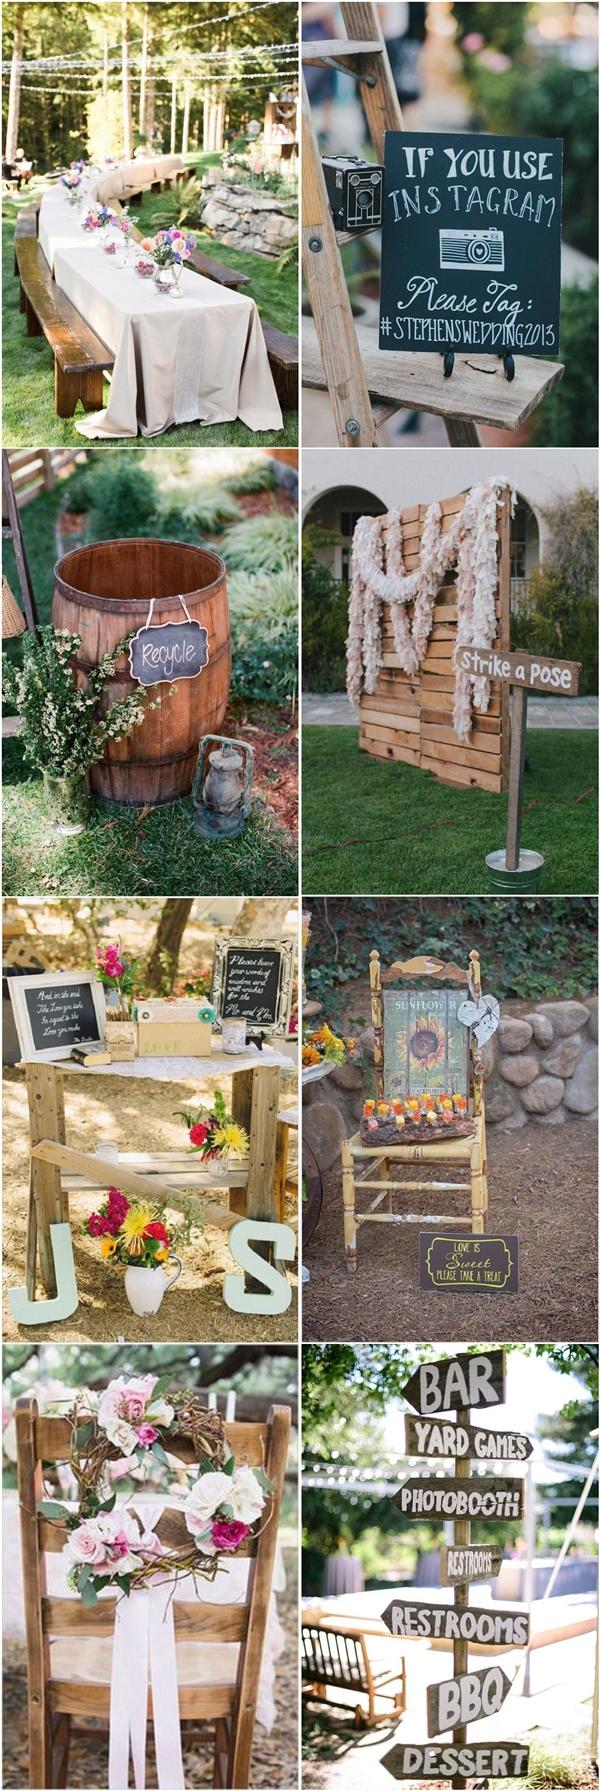 35 Rustic Backyard Wedding Decoration Ideas   Deer Pearl ... on Rustic Backyard Ideas id=28447